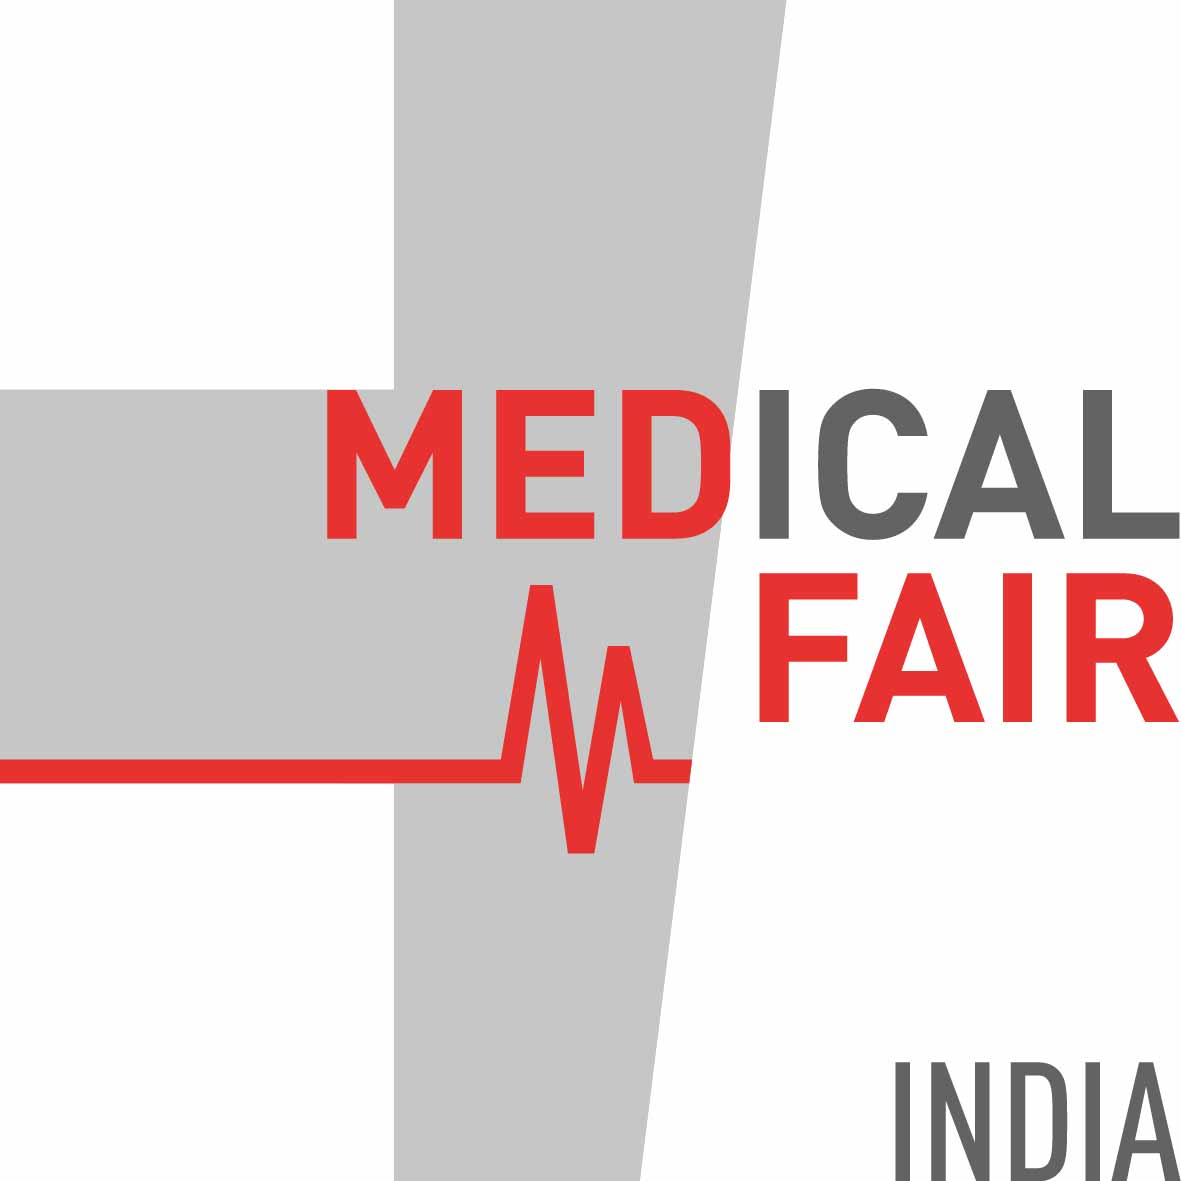 /storage/images/fairs/1634307780_MEDICAL_FAIR_INDIA_Logo.jpg